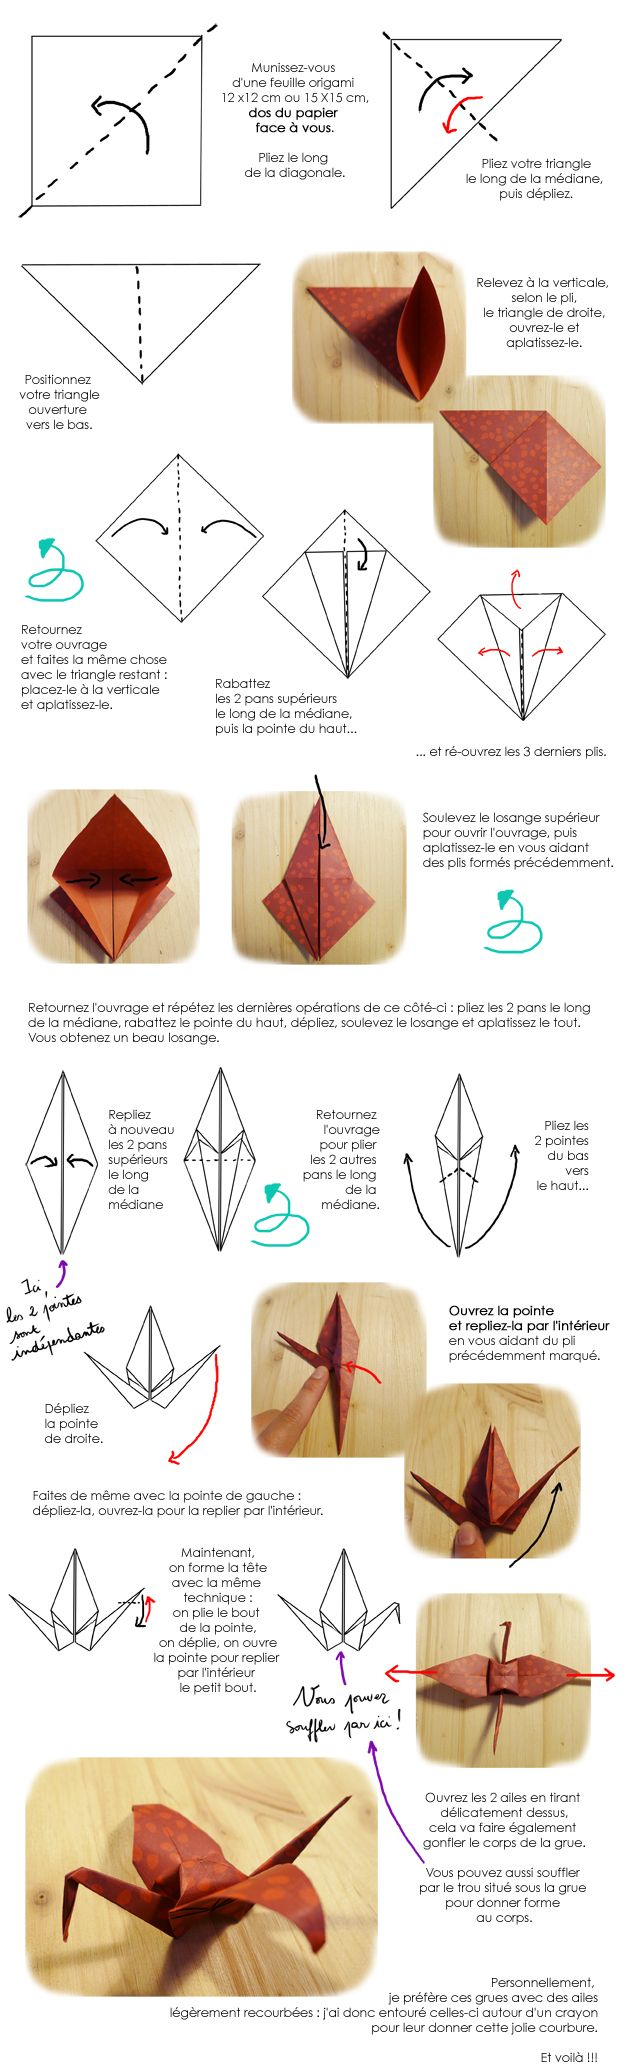 Tutoriel grue origami